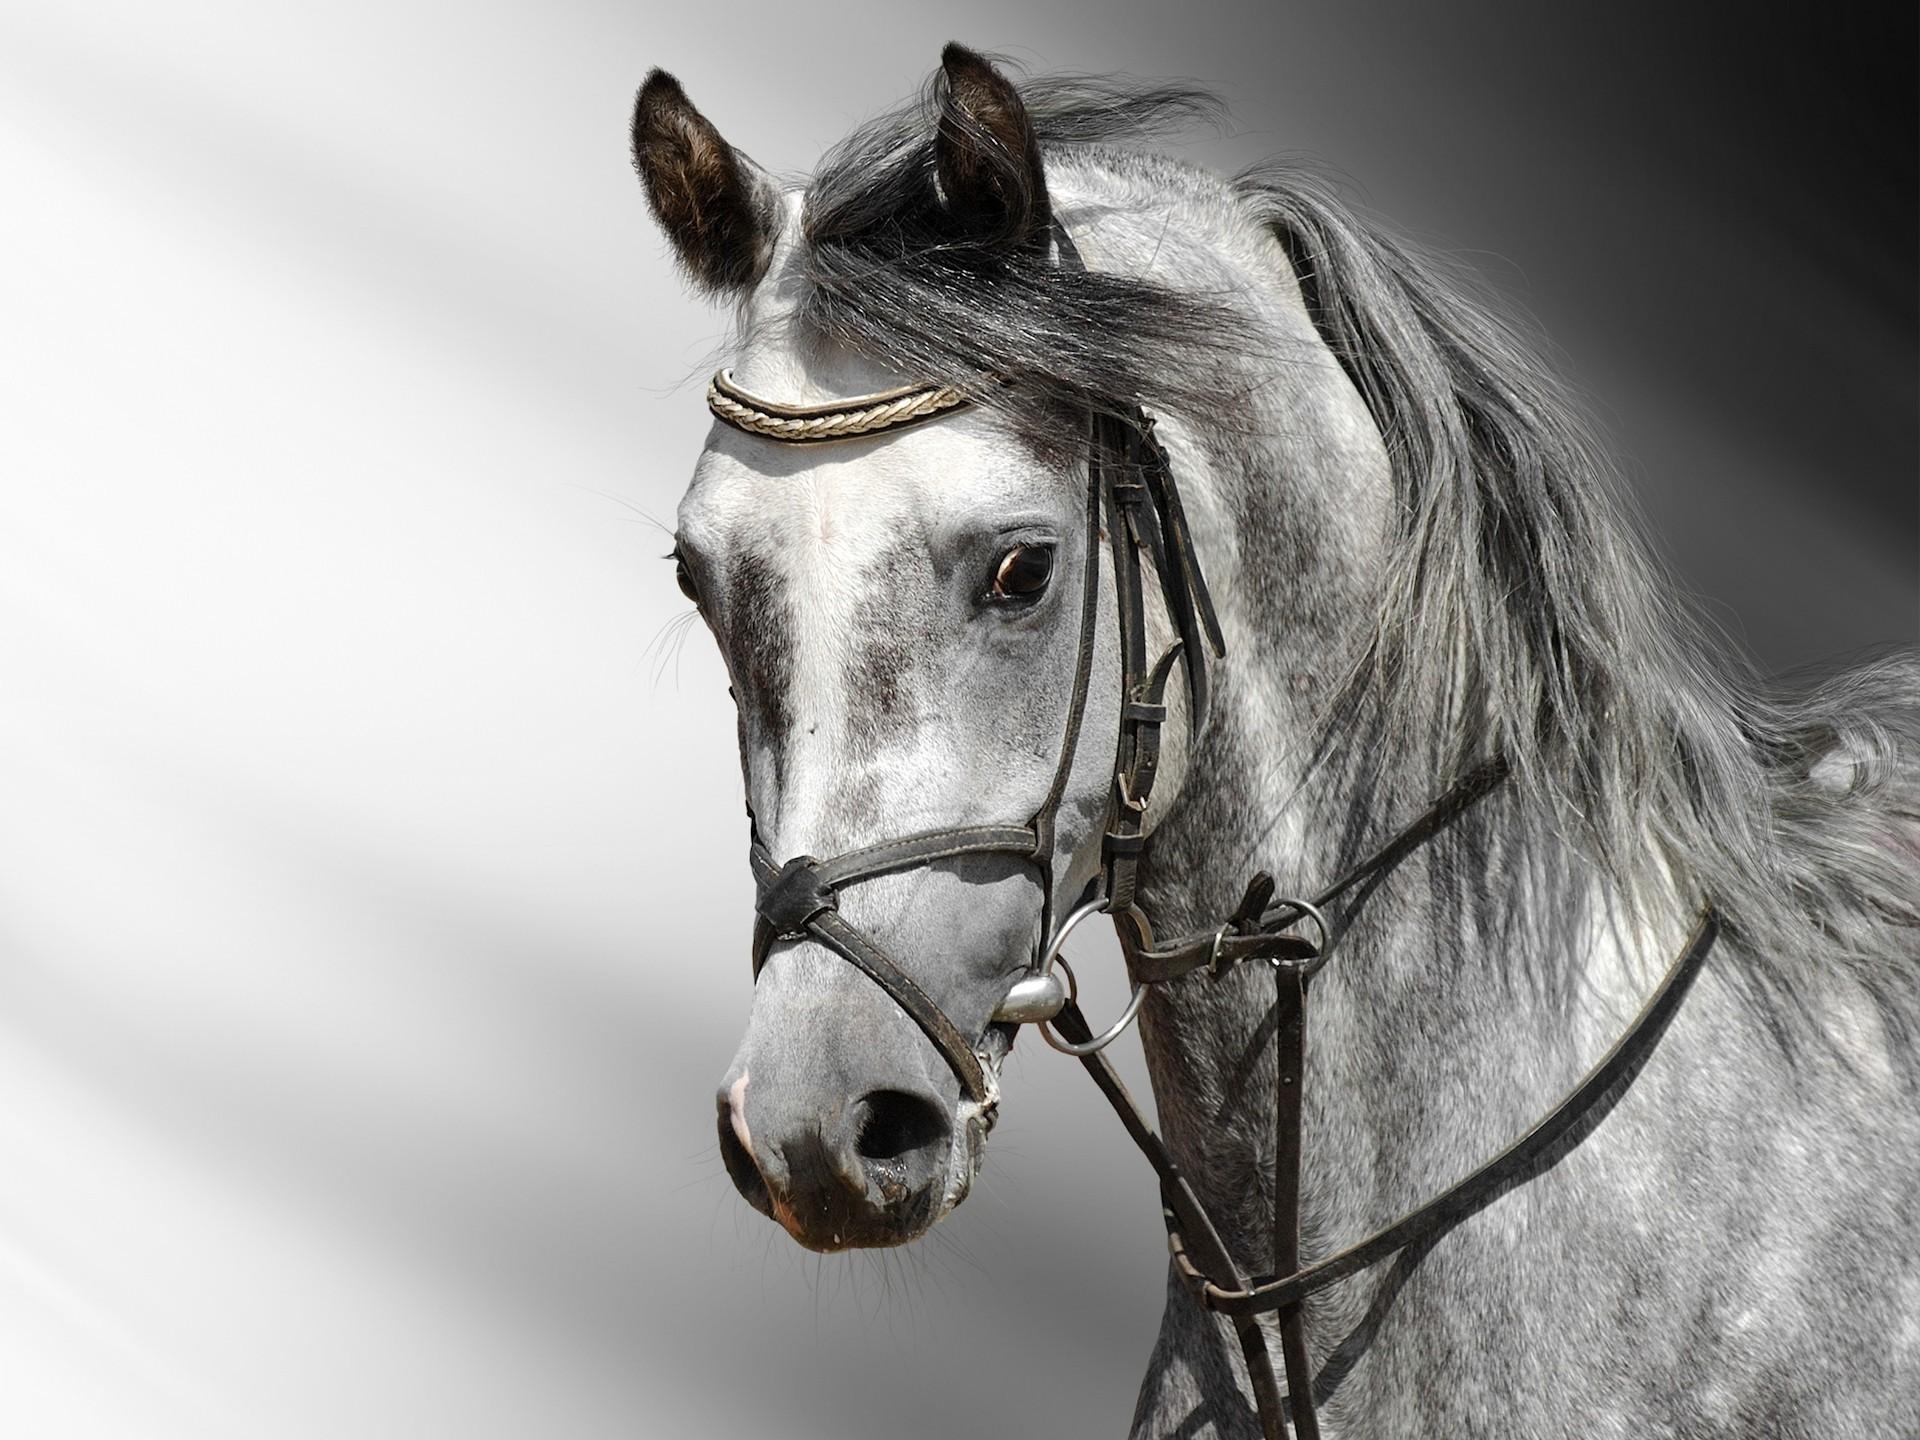 Horse Wallpaper Hd Horse Hd Black And White 1920x1440 Download Hd Wallpaper Wallpapertip